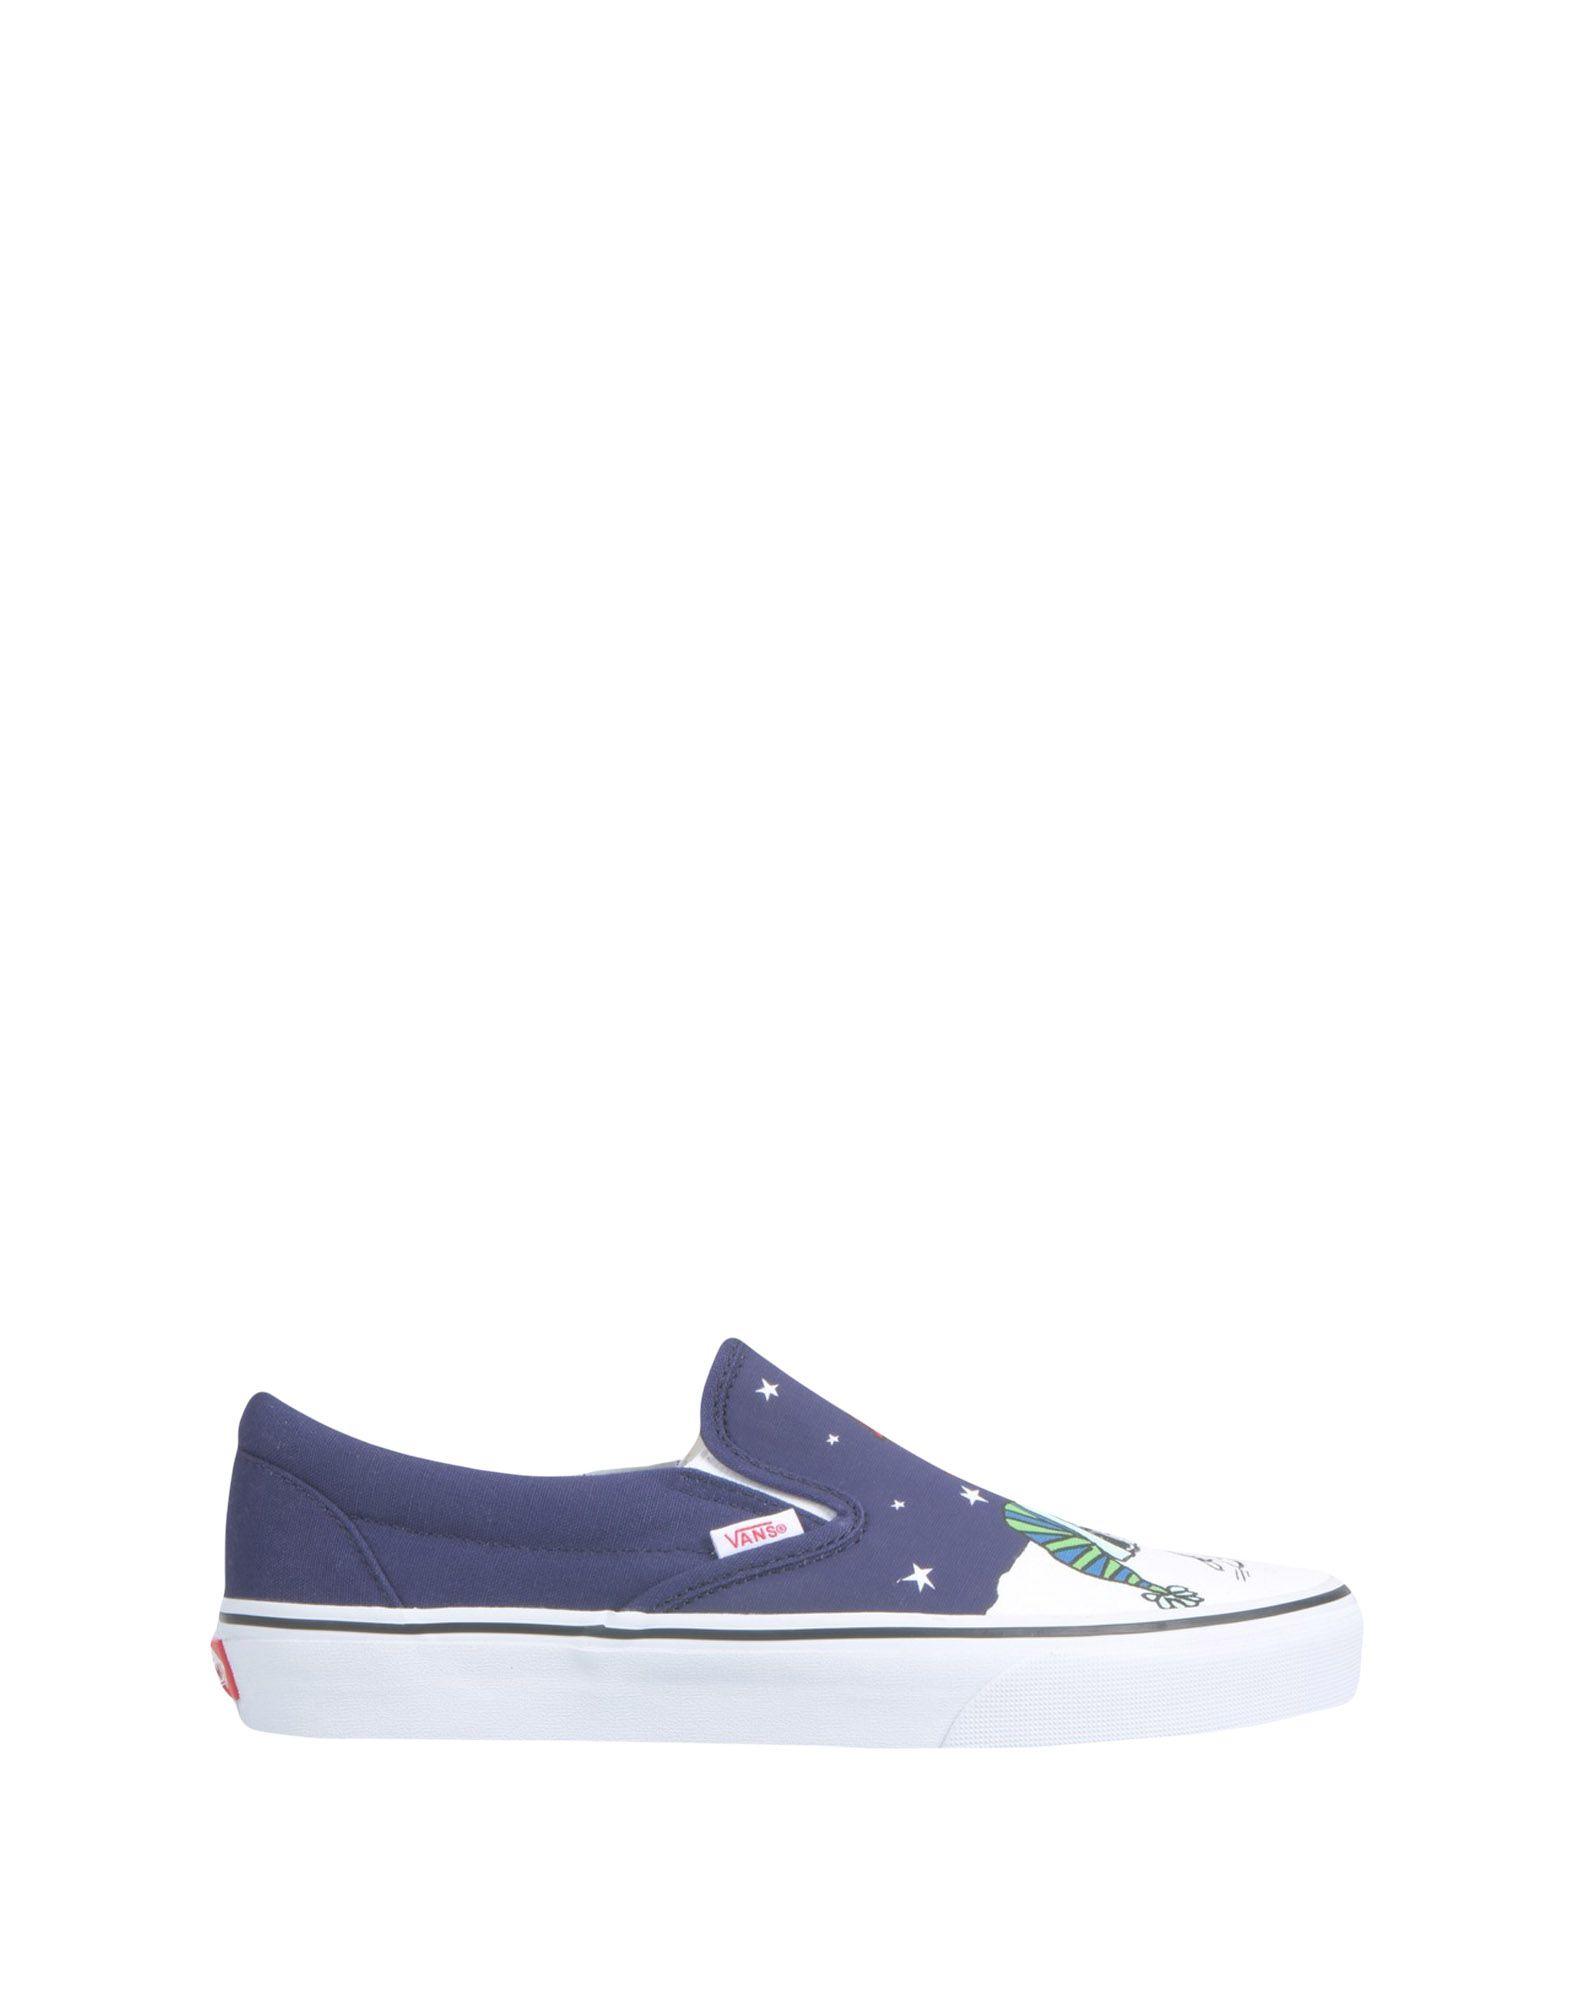 Vans Ua Classic Slip-On Peanuts - Sneakers Sneakers Sneakers - Men Vans Sneakers online on  Canada - 11403196TX e5e21c